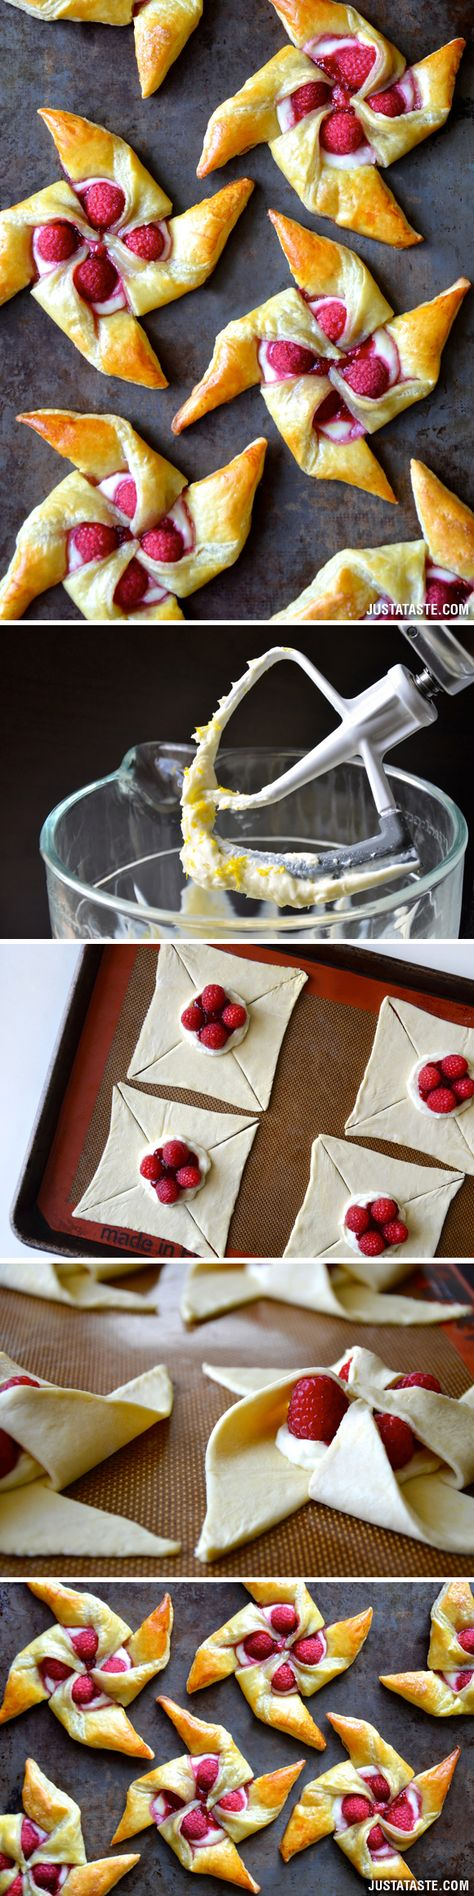 Raspberry Cream Cheese Pinwheel Pastries #recipe